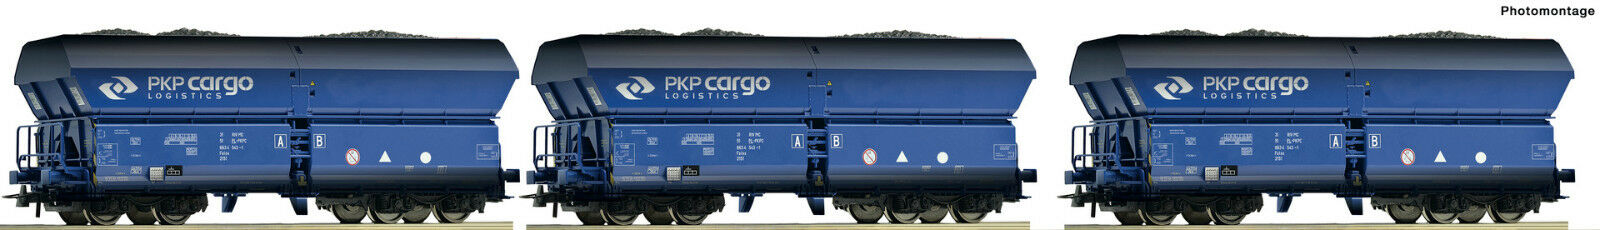 Roco 76130-3-tlg ab Werk ausverka PKP Cargo Set: Selbstentladewag gealtert